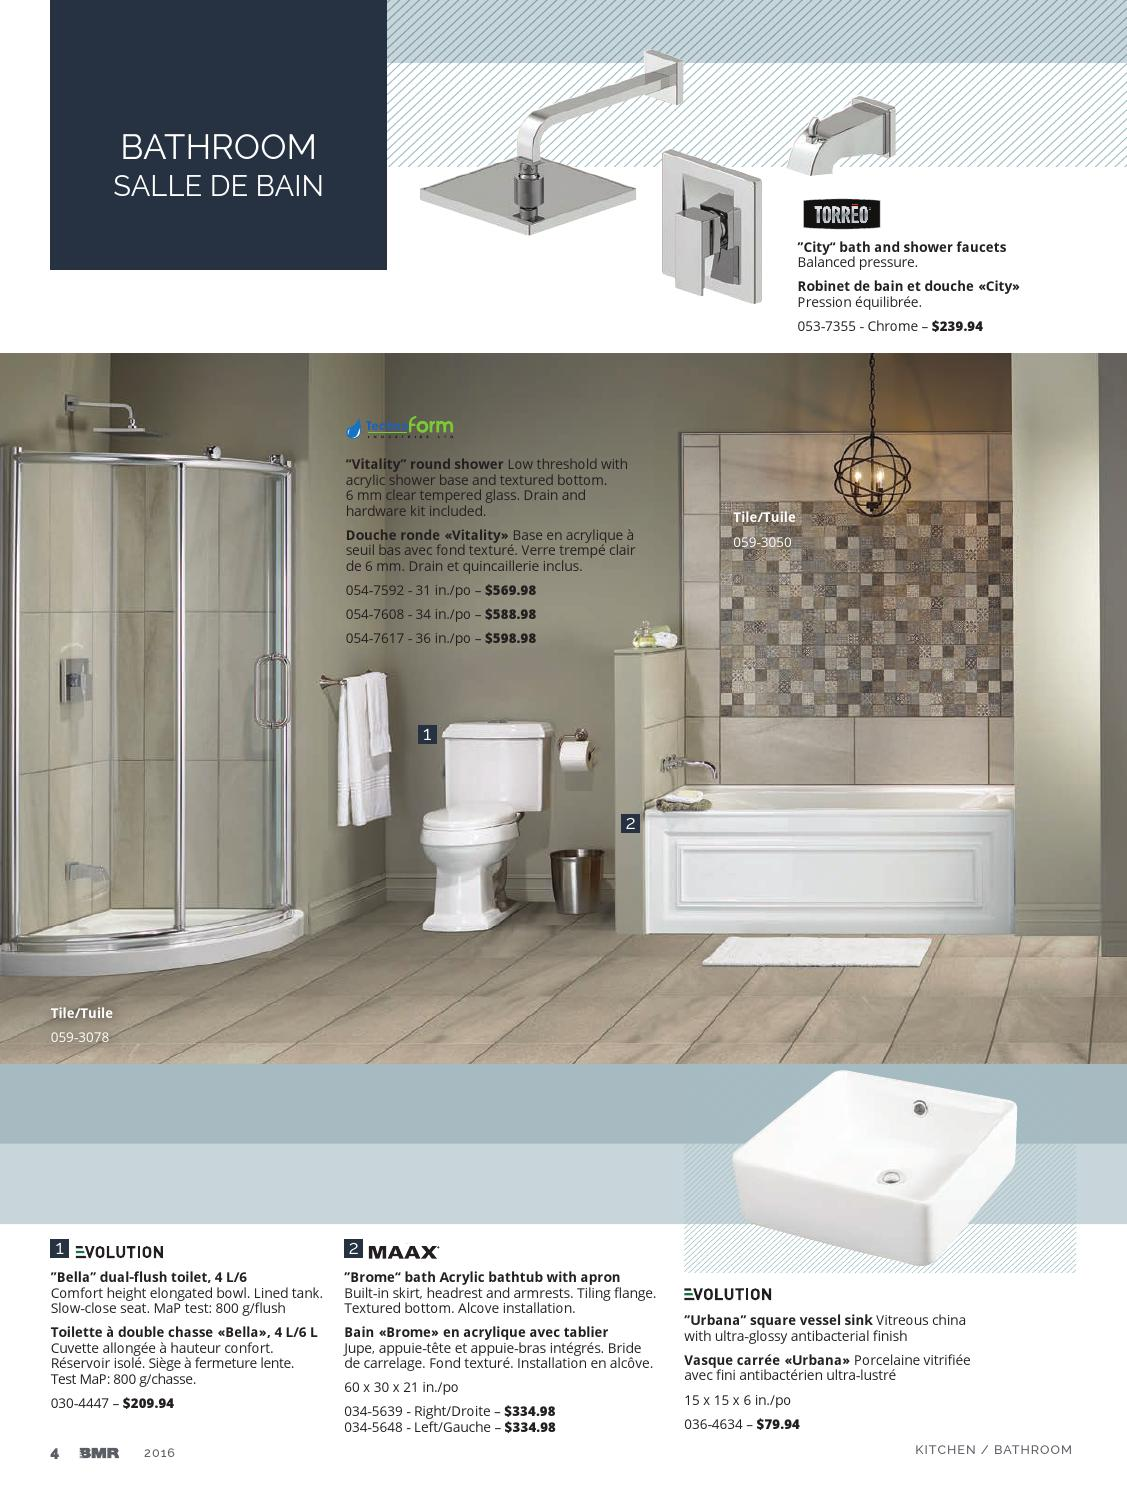 Bathroom Salle De Bain kitchen and bathroom 2016groupe bmr - issuu